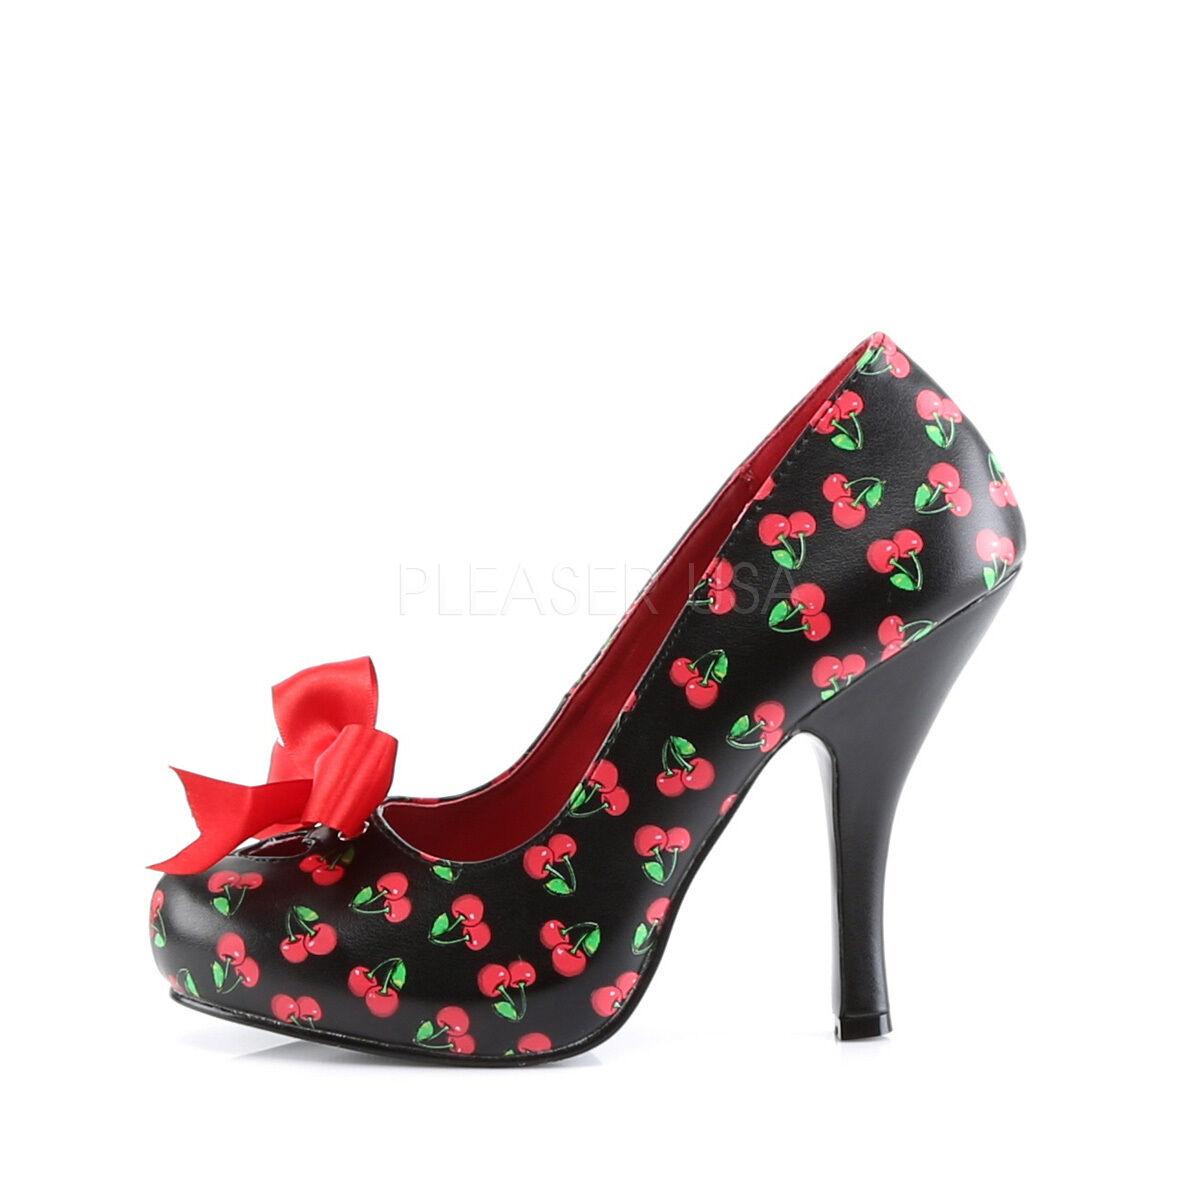 PLEASER CUTIEPIE 06 PIN Schuhe UP COUTURE 4 1/2